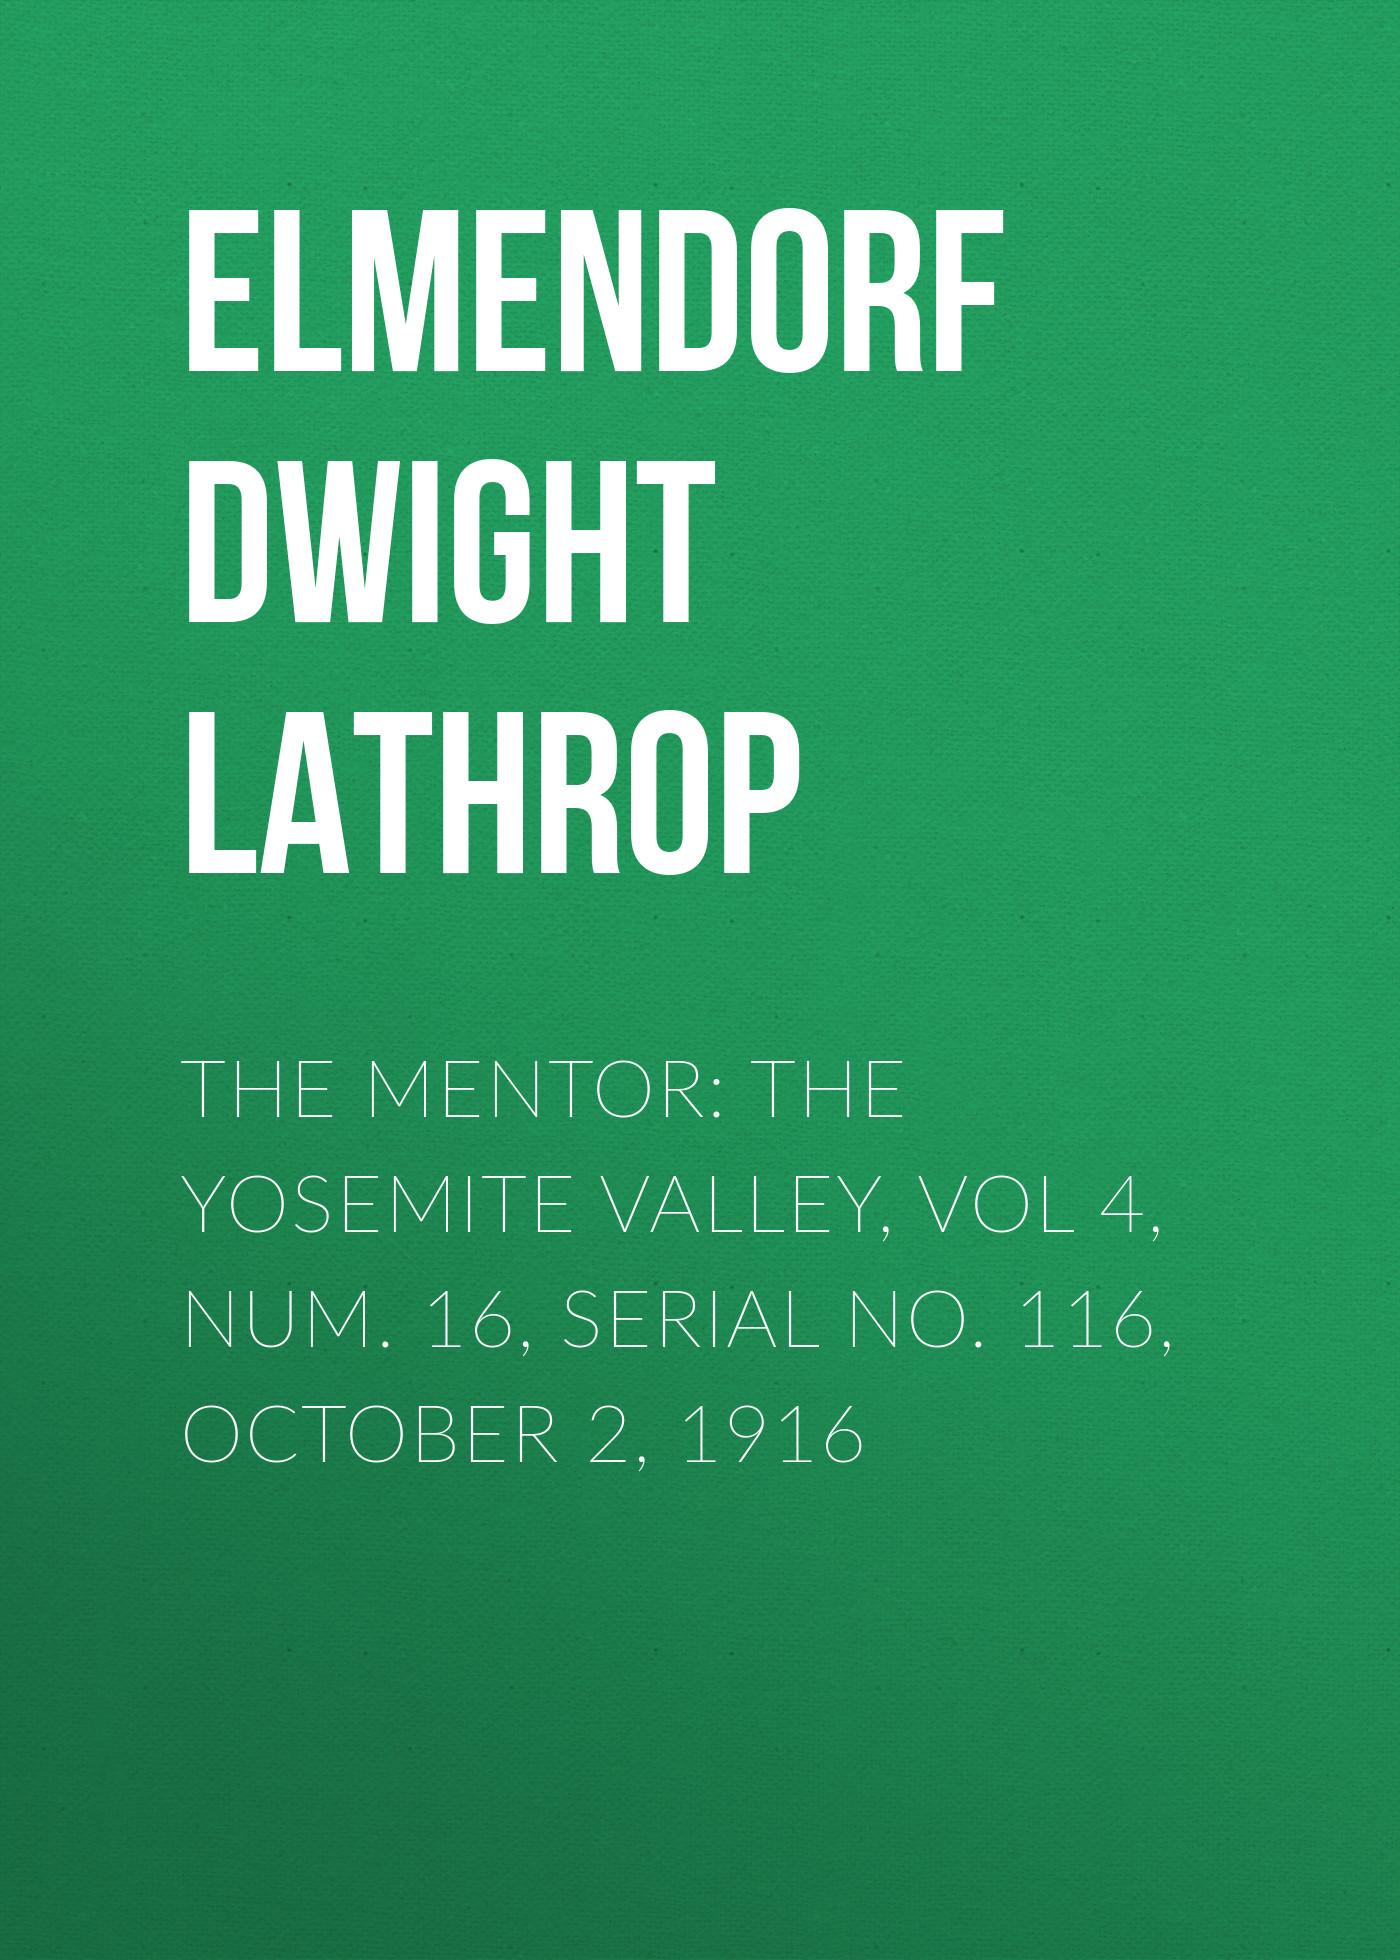 Elmendorf Dwight Lathrop The Mentor: The Yosemite Valley, Vol 4, Num. 16, Serial No. 116, October 2, 1916 ansel adams in yosemite valley celebrating the park at 150